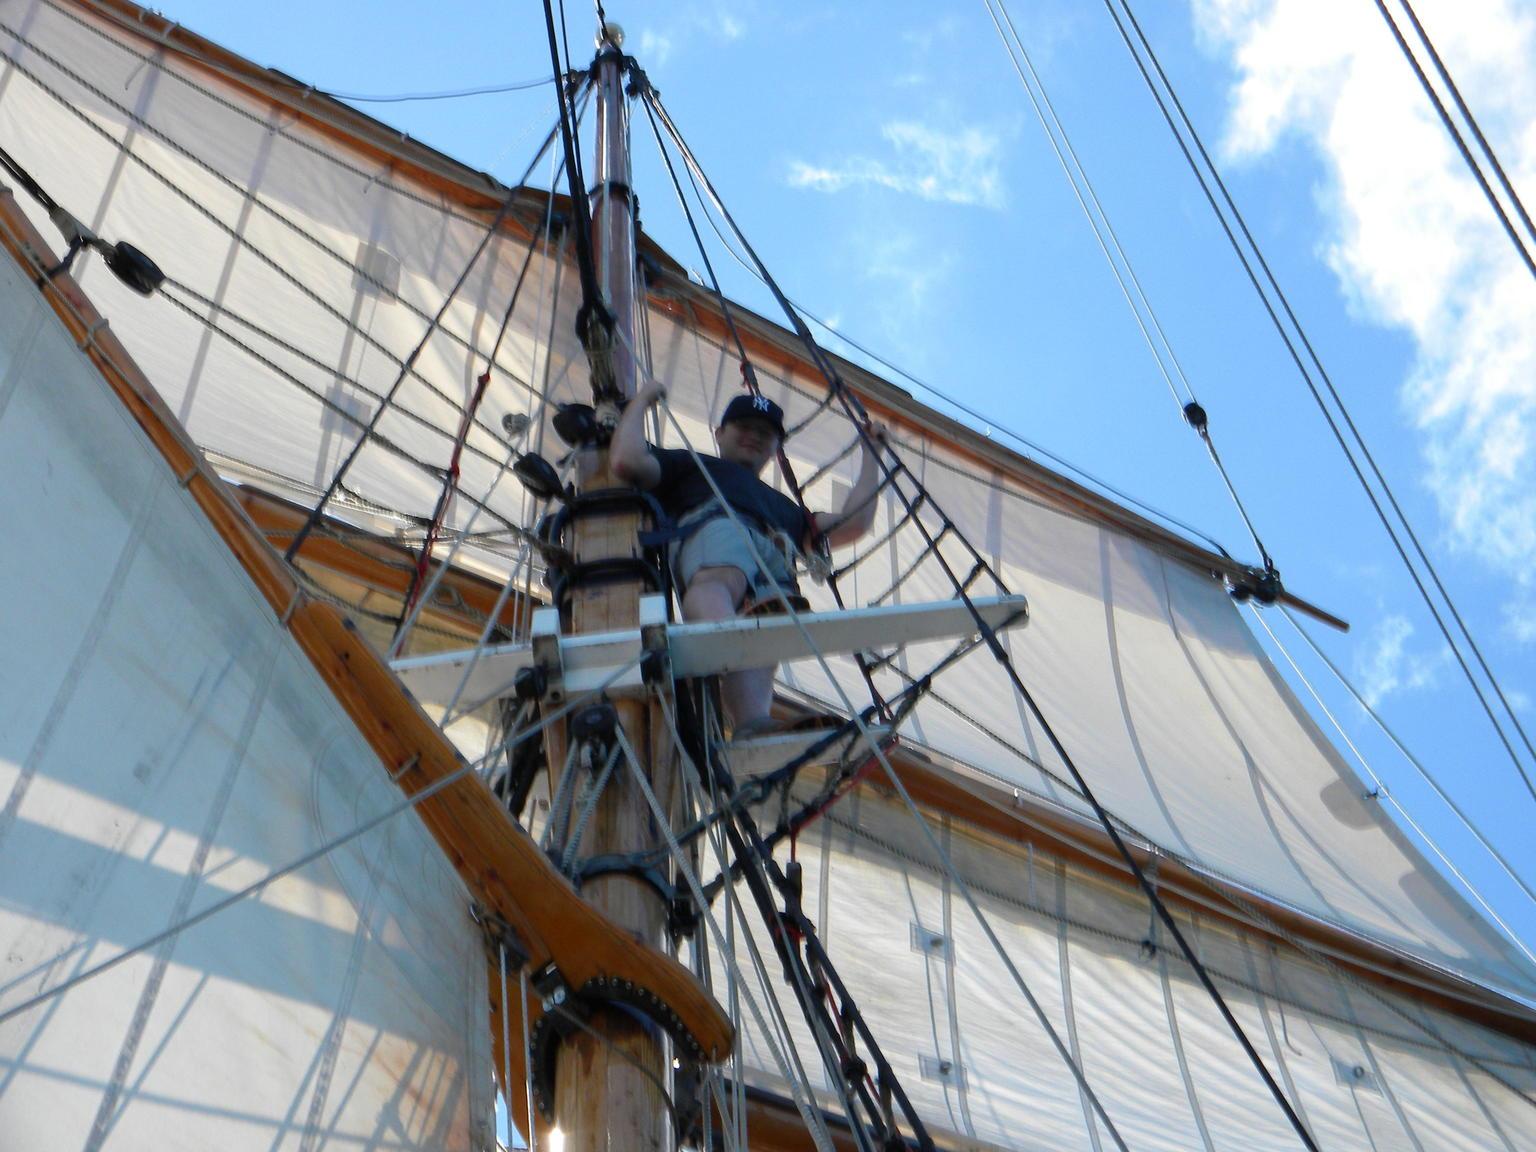 MÁS FOTOS, Bay of Islands Tall Ship Sailing on 'R. Tucker Thompson' Including BBQ Lunch